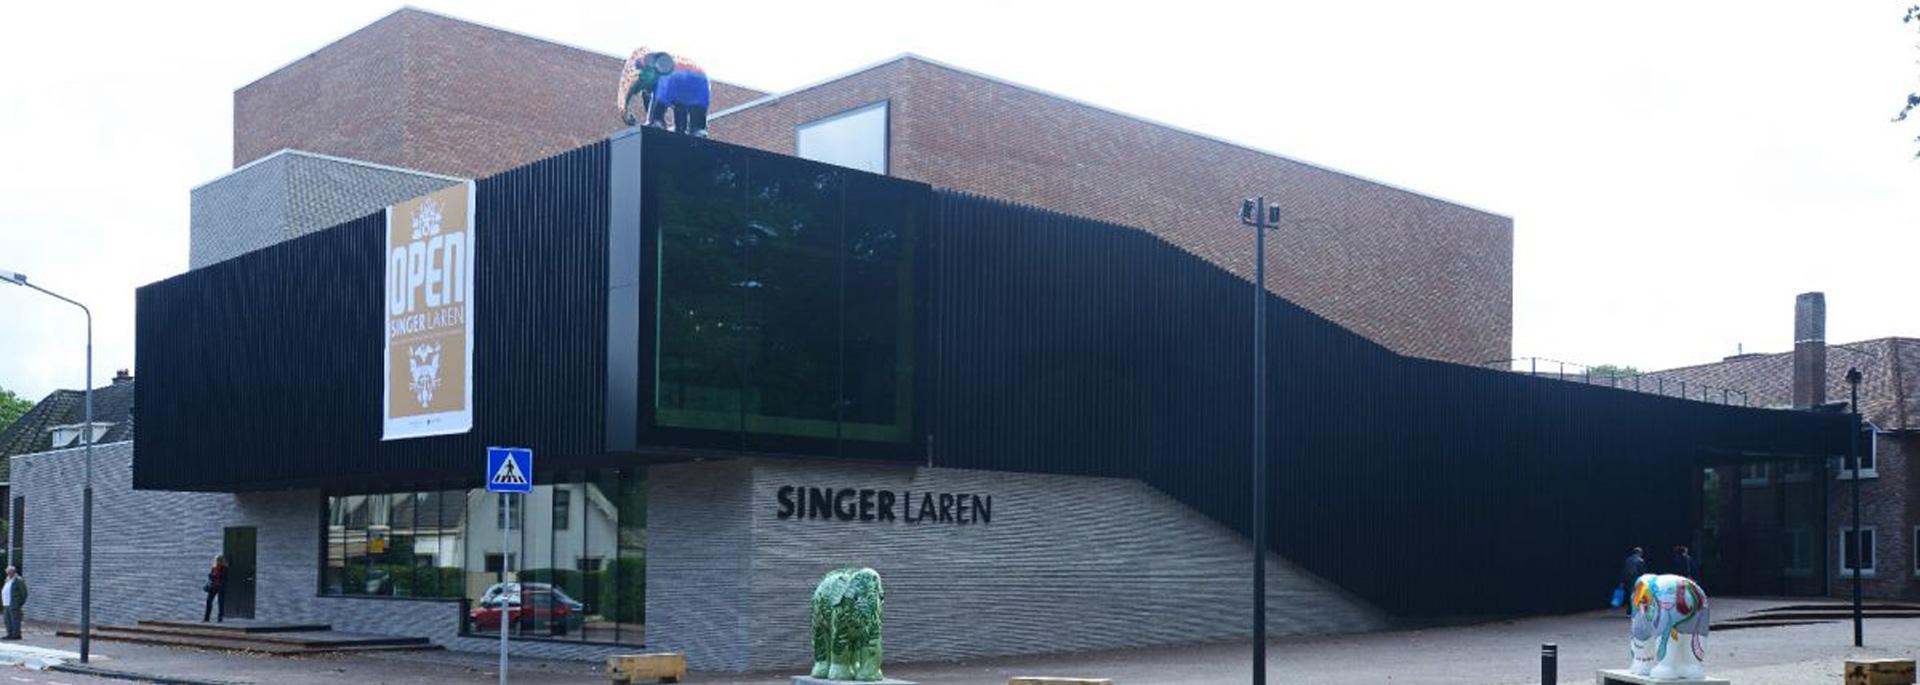 singer laren guitarpoll